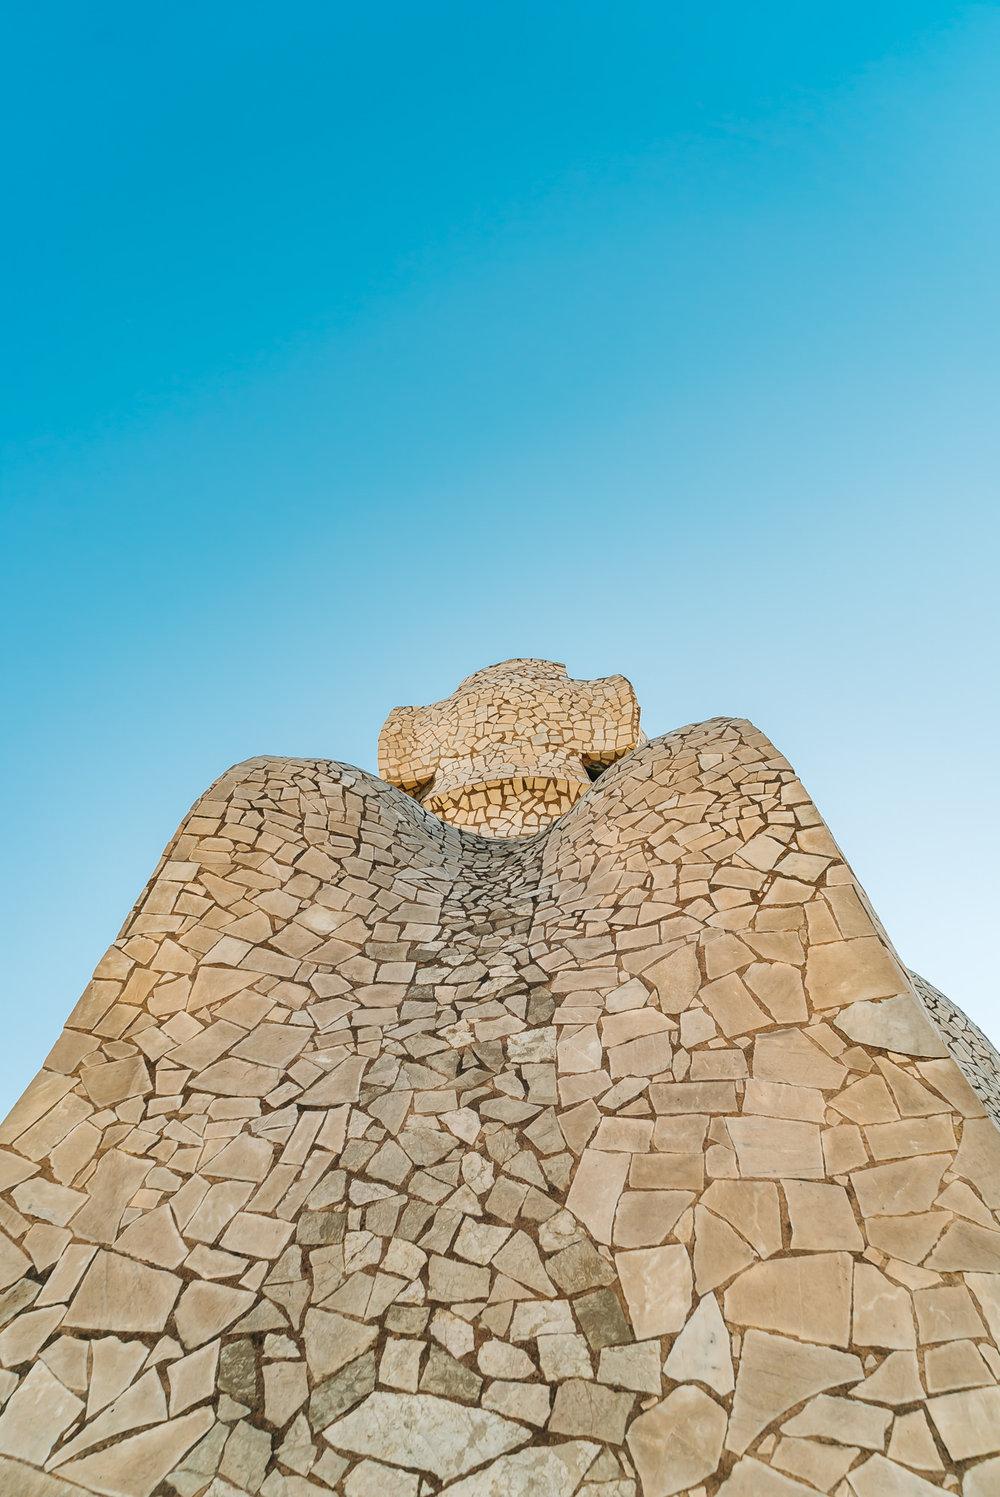 Gaudi's Earth sculpture